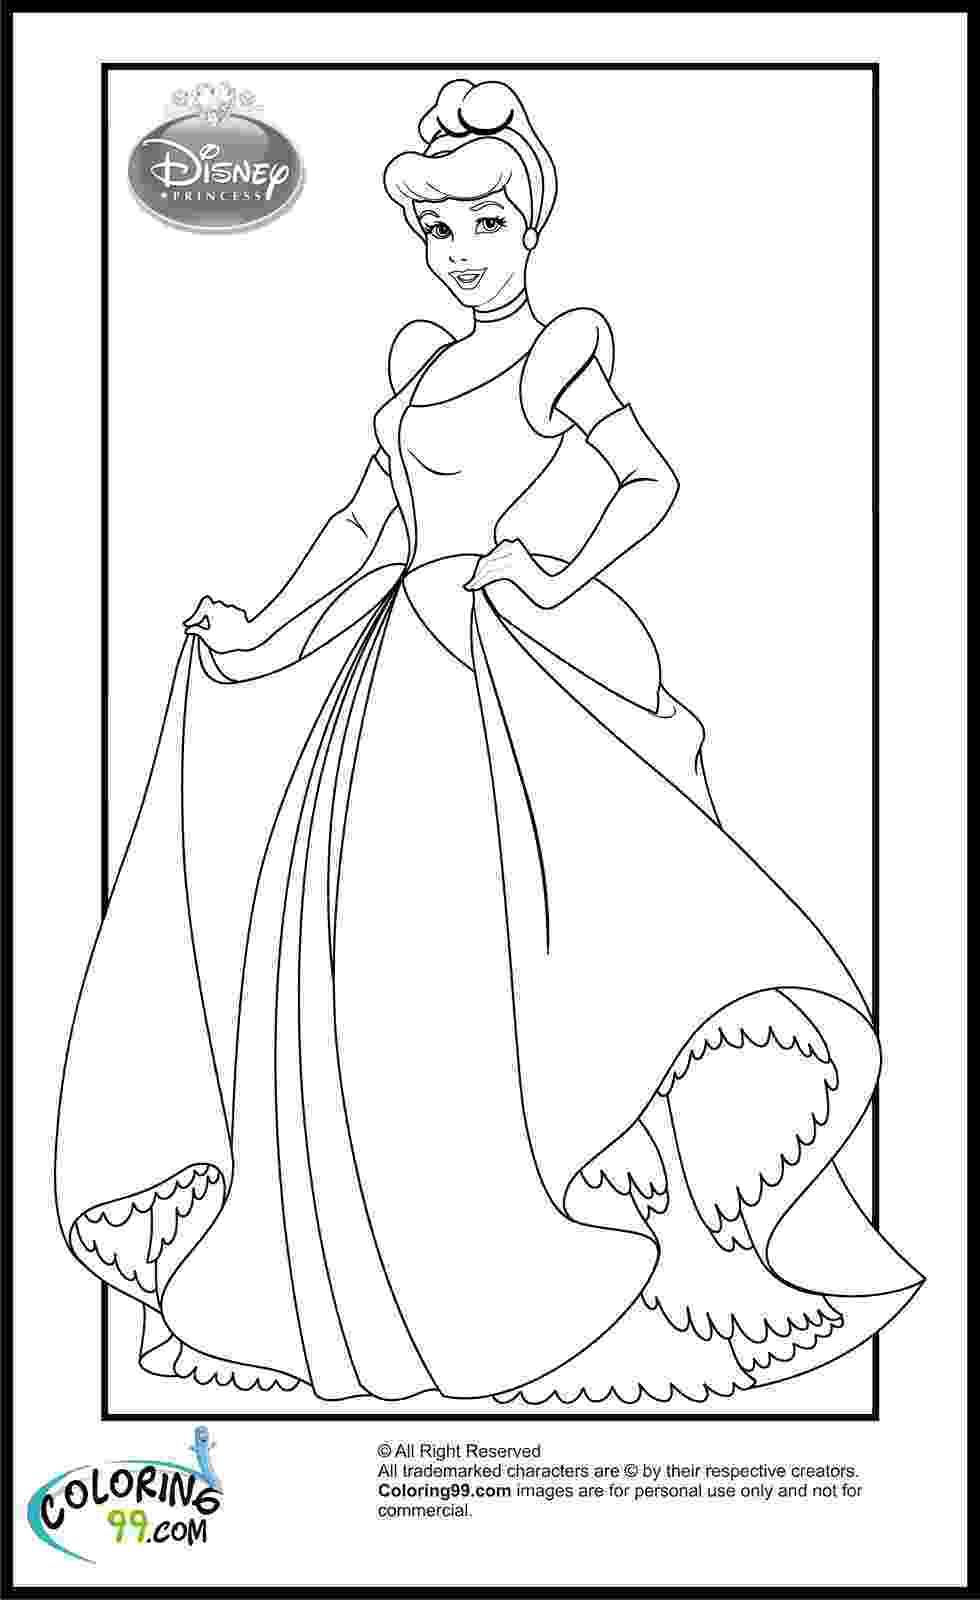 coloring pages disney disney princess belle coloring pages disney pages coloring